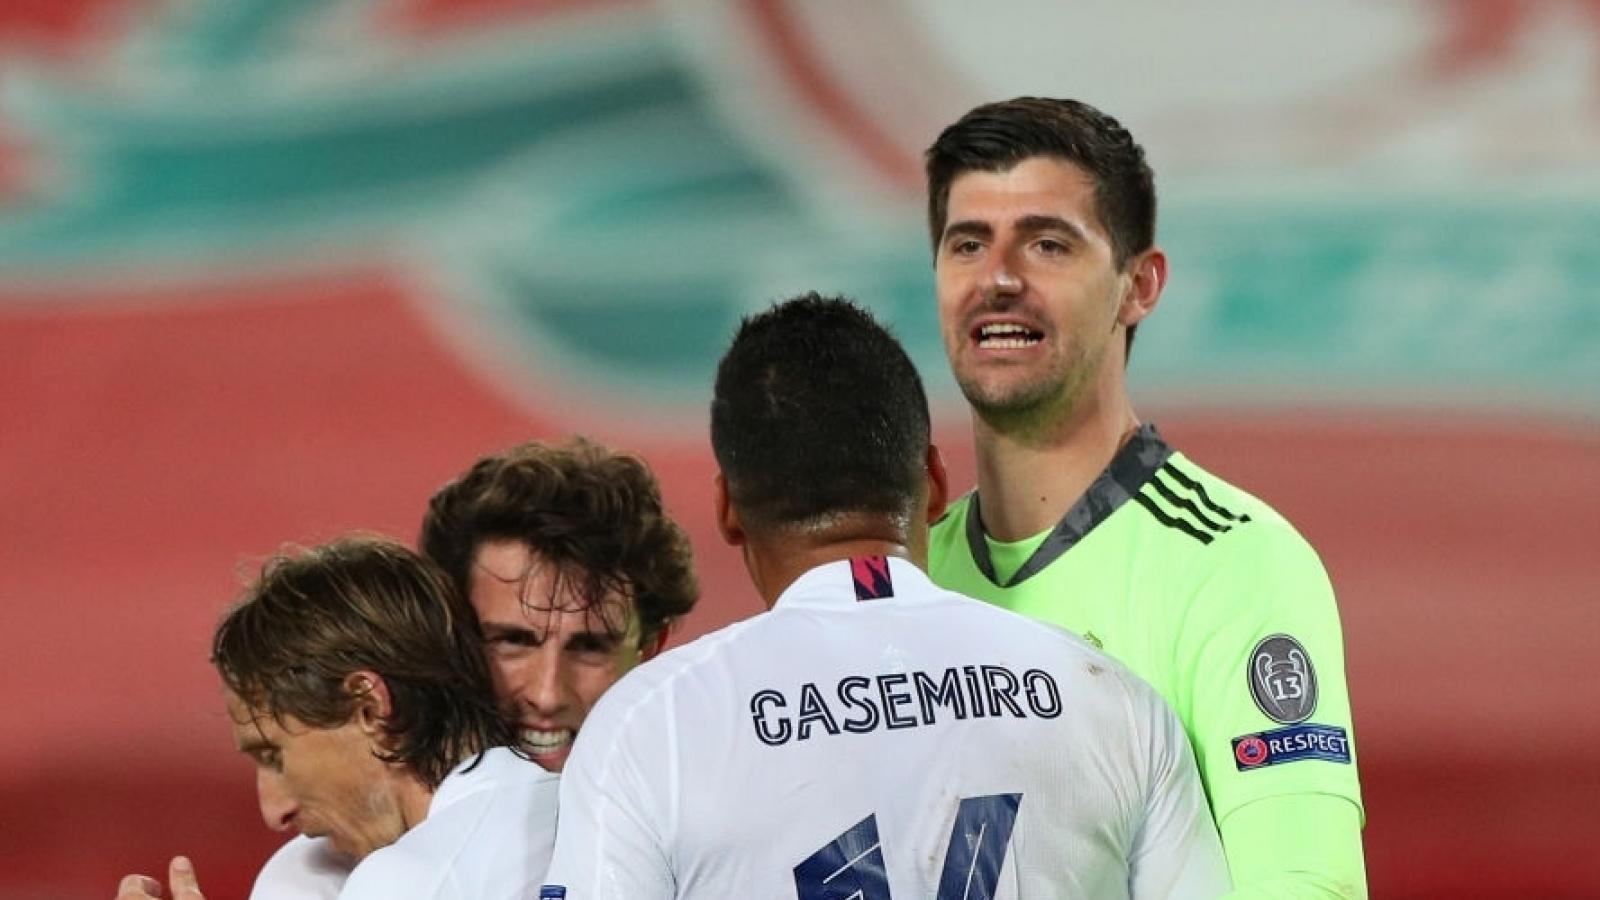 Real Madrid tiễn Liverpool rời Champions League, gặp Chelsea ở bán kết